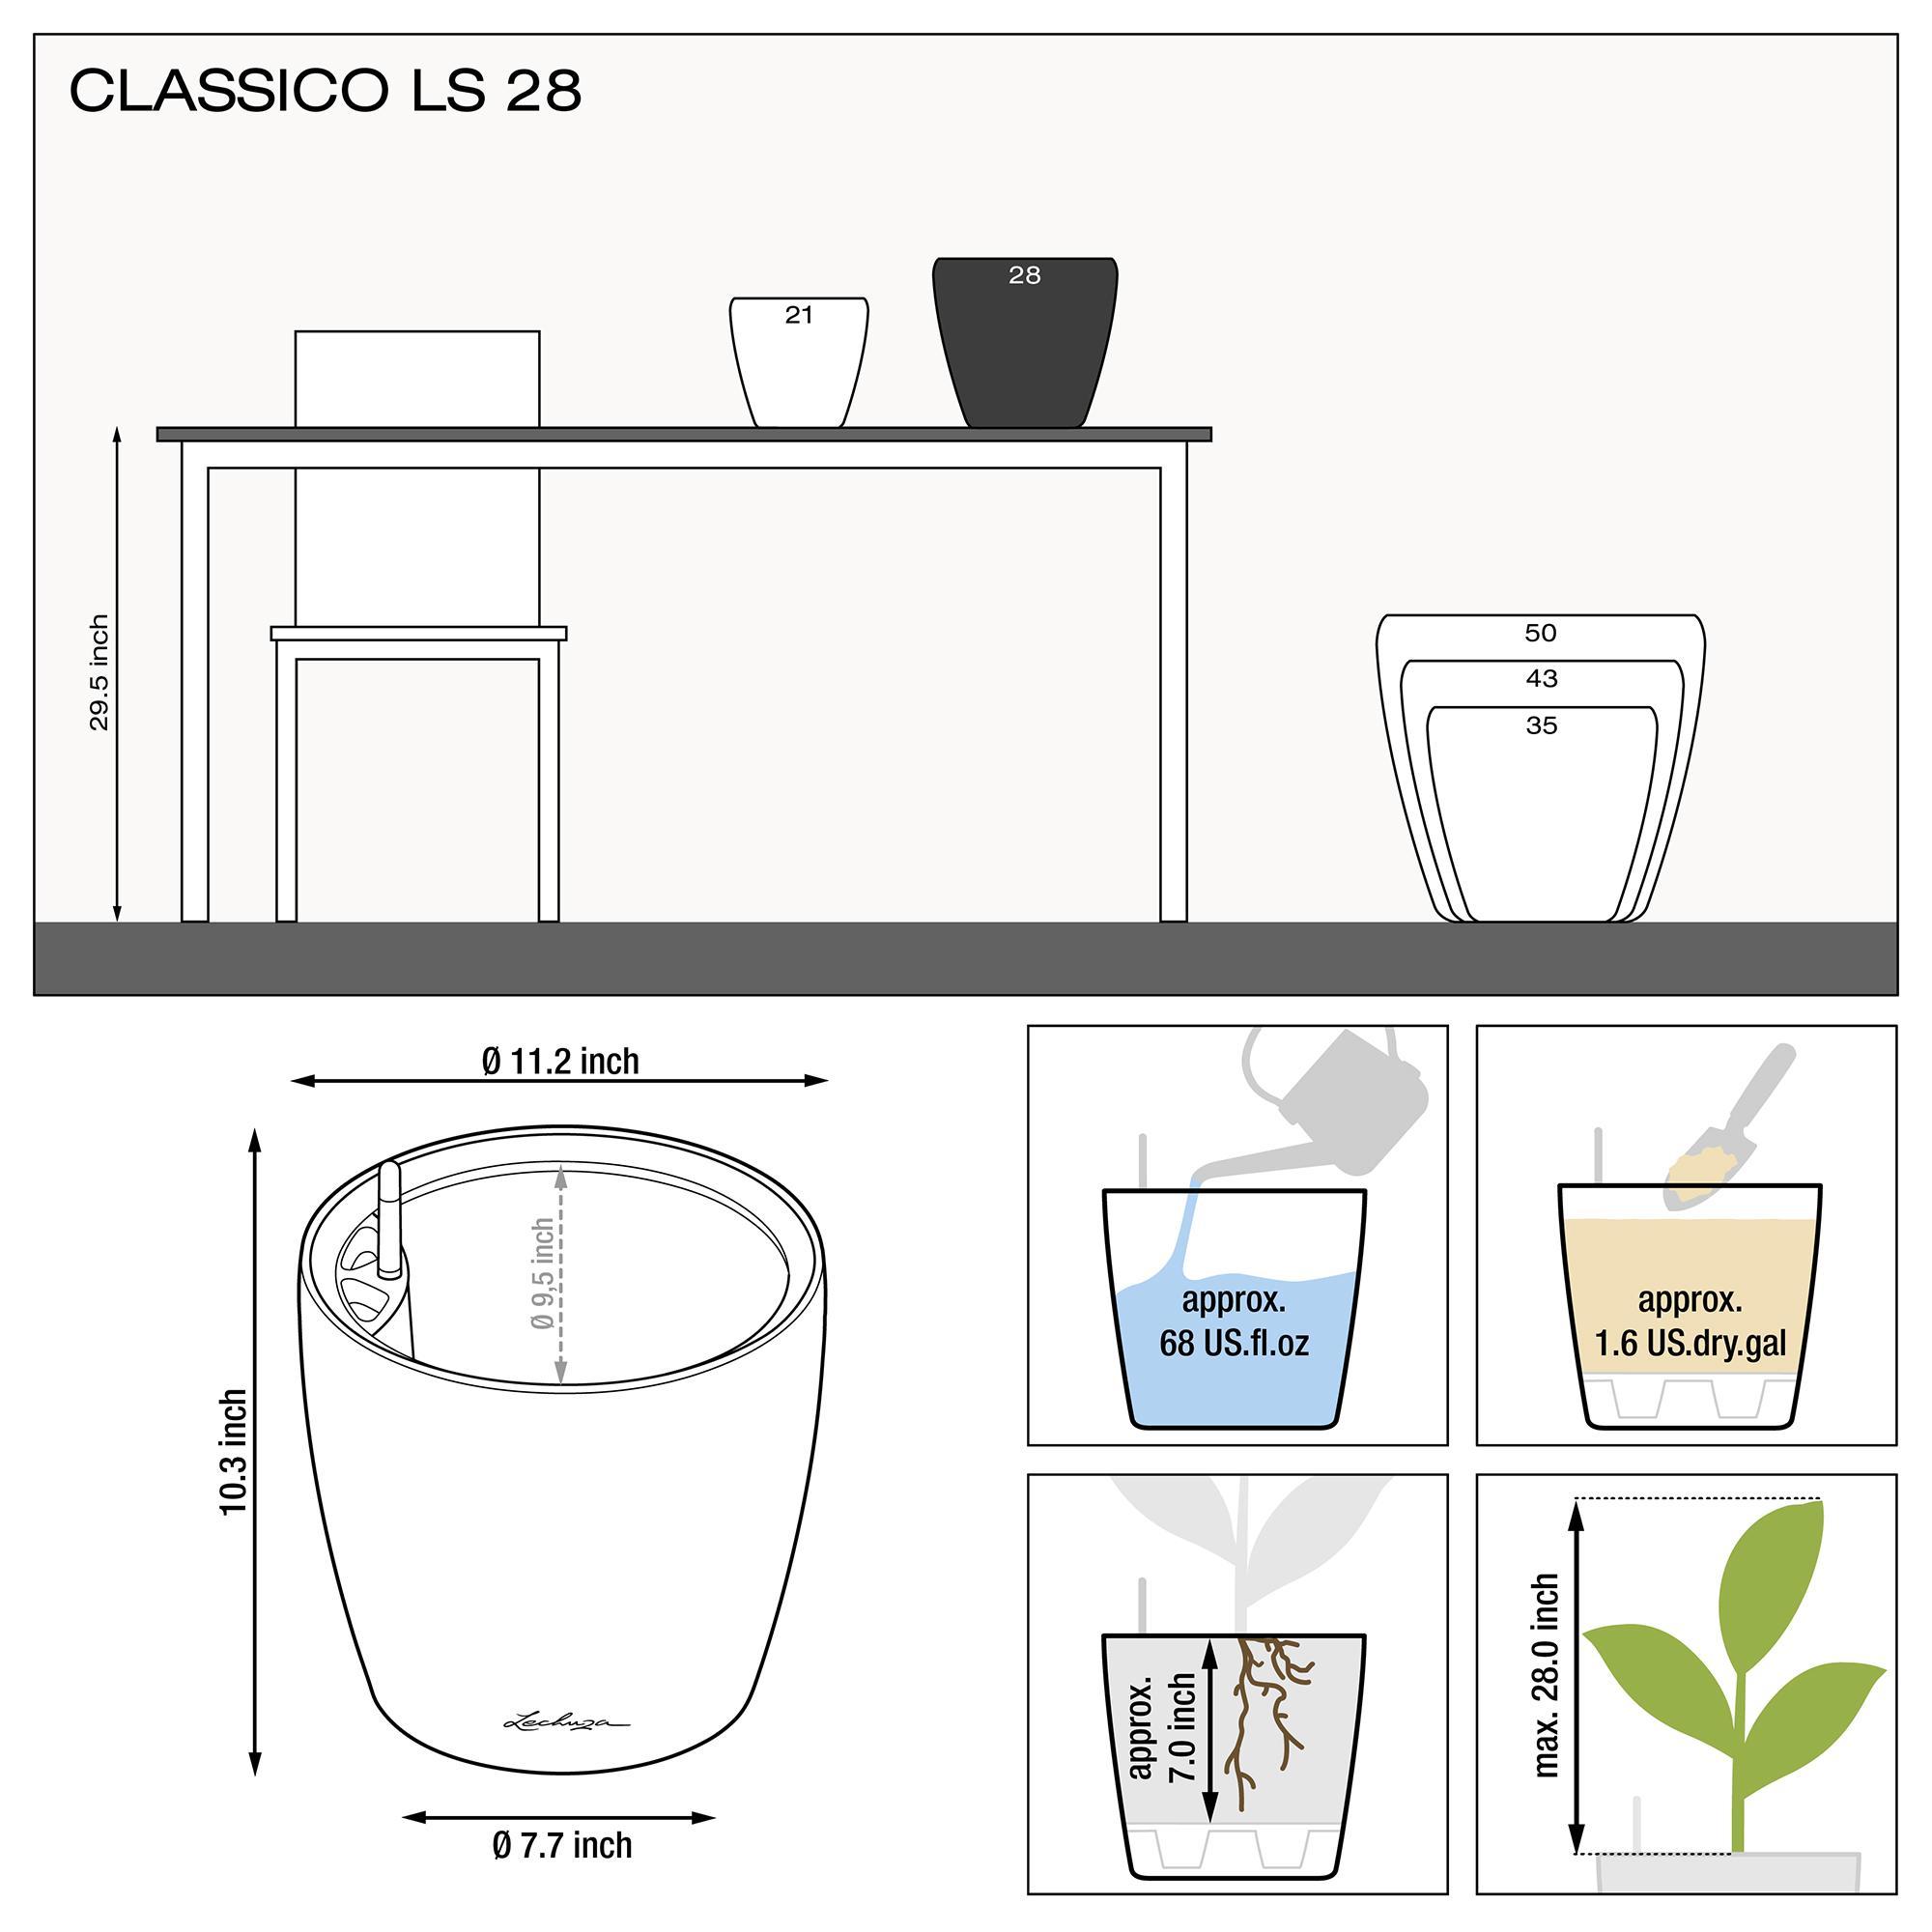 le_classico-ls28_product_addi_nz_us